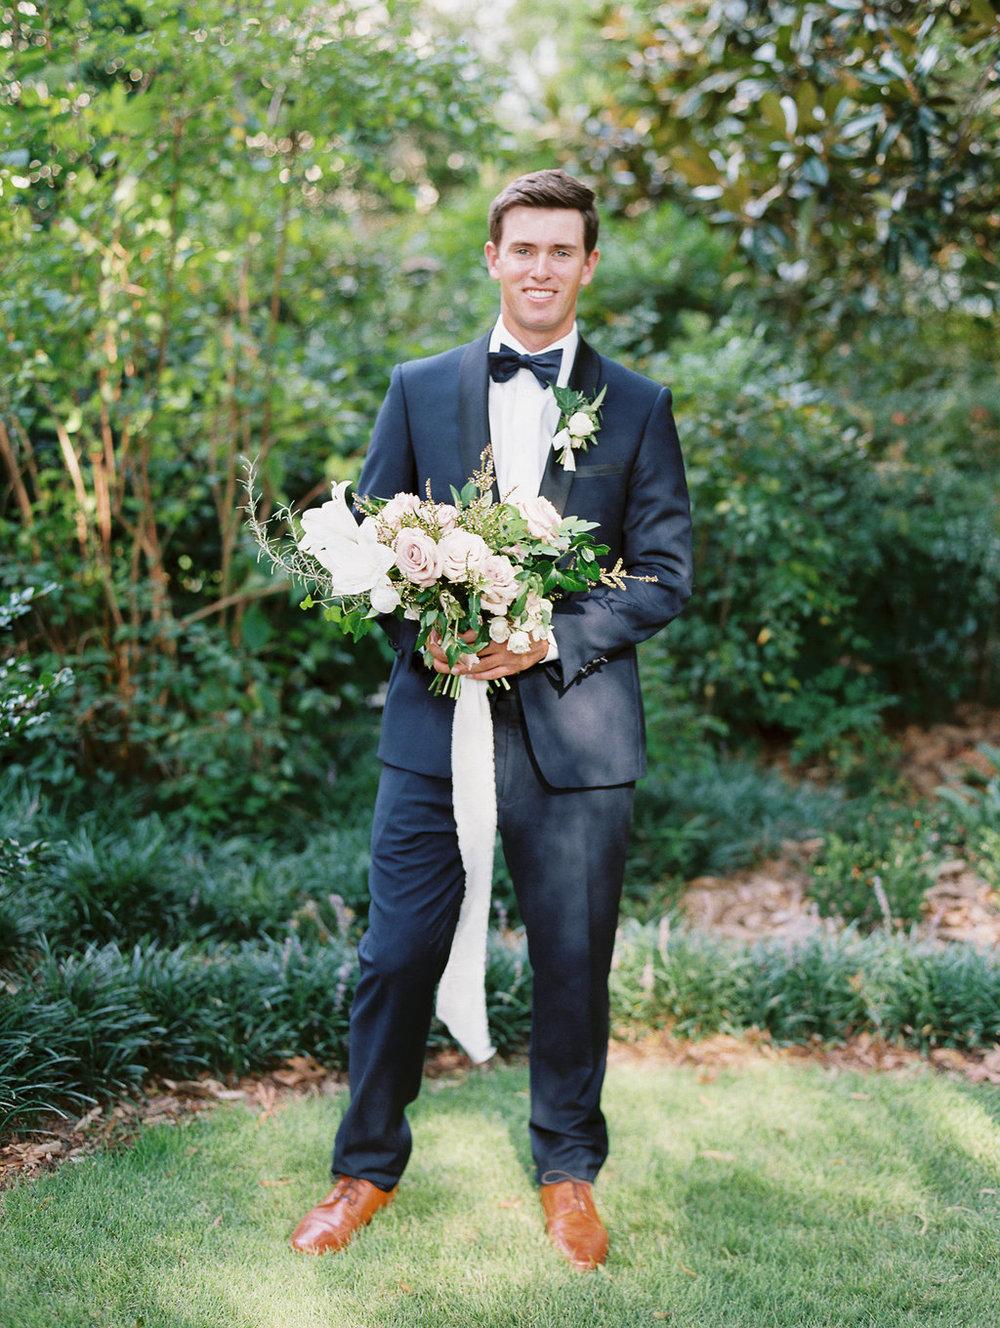 athens-founders-memorial-garden-wedding-photography-hannah-forsberg-atlanta-wedding-photographer-19.jpg